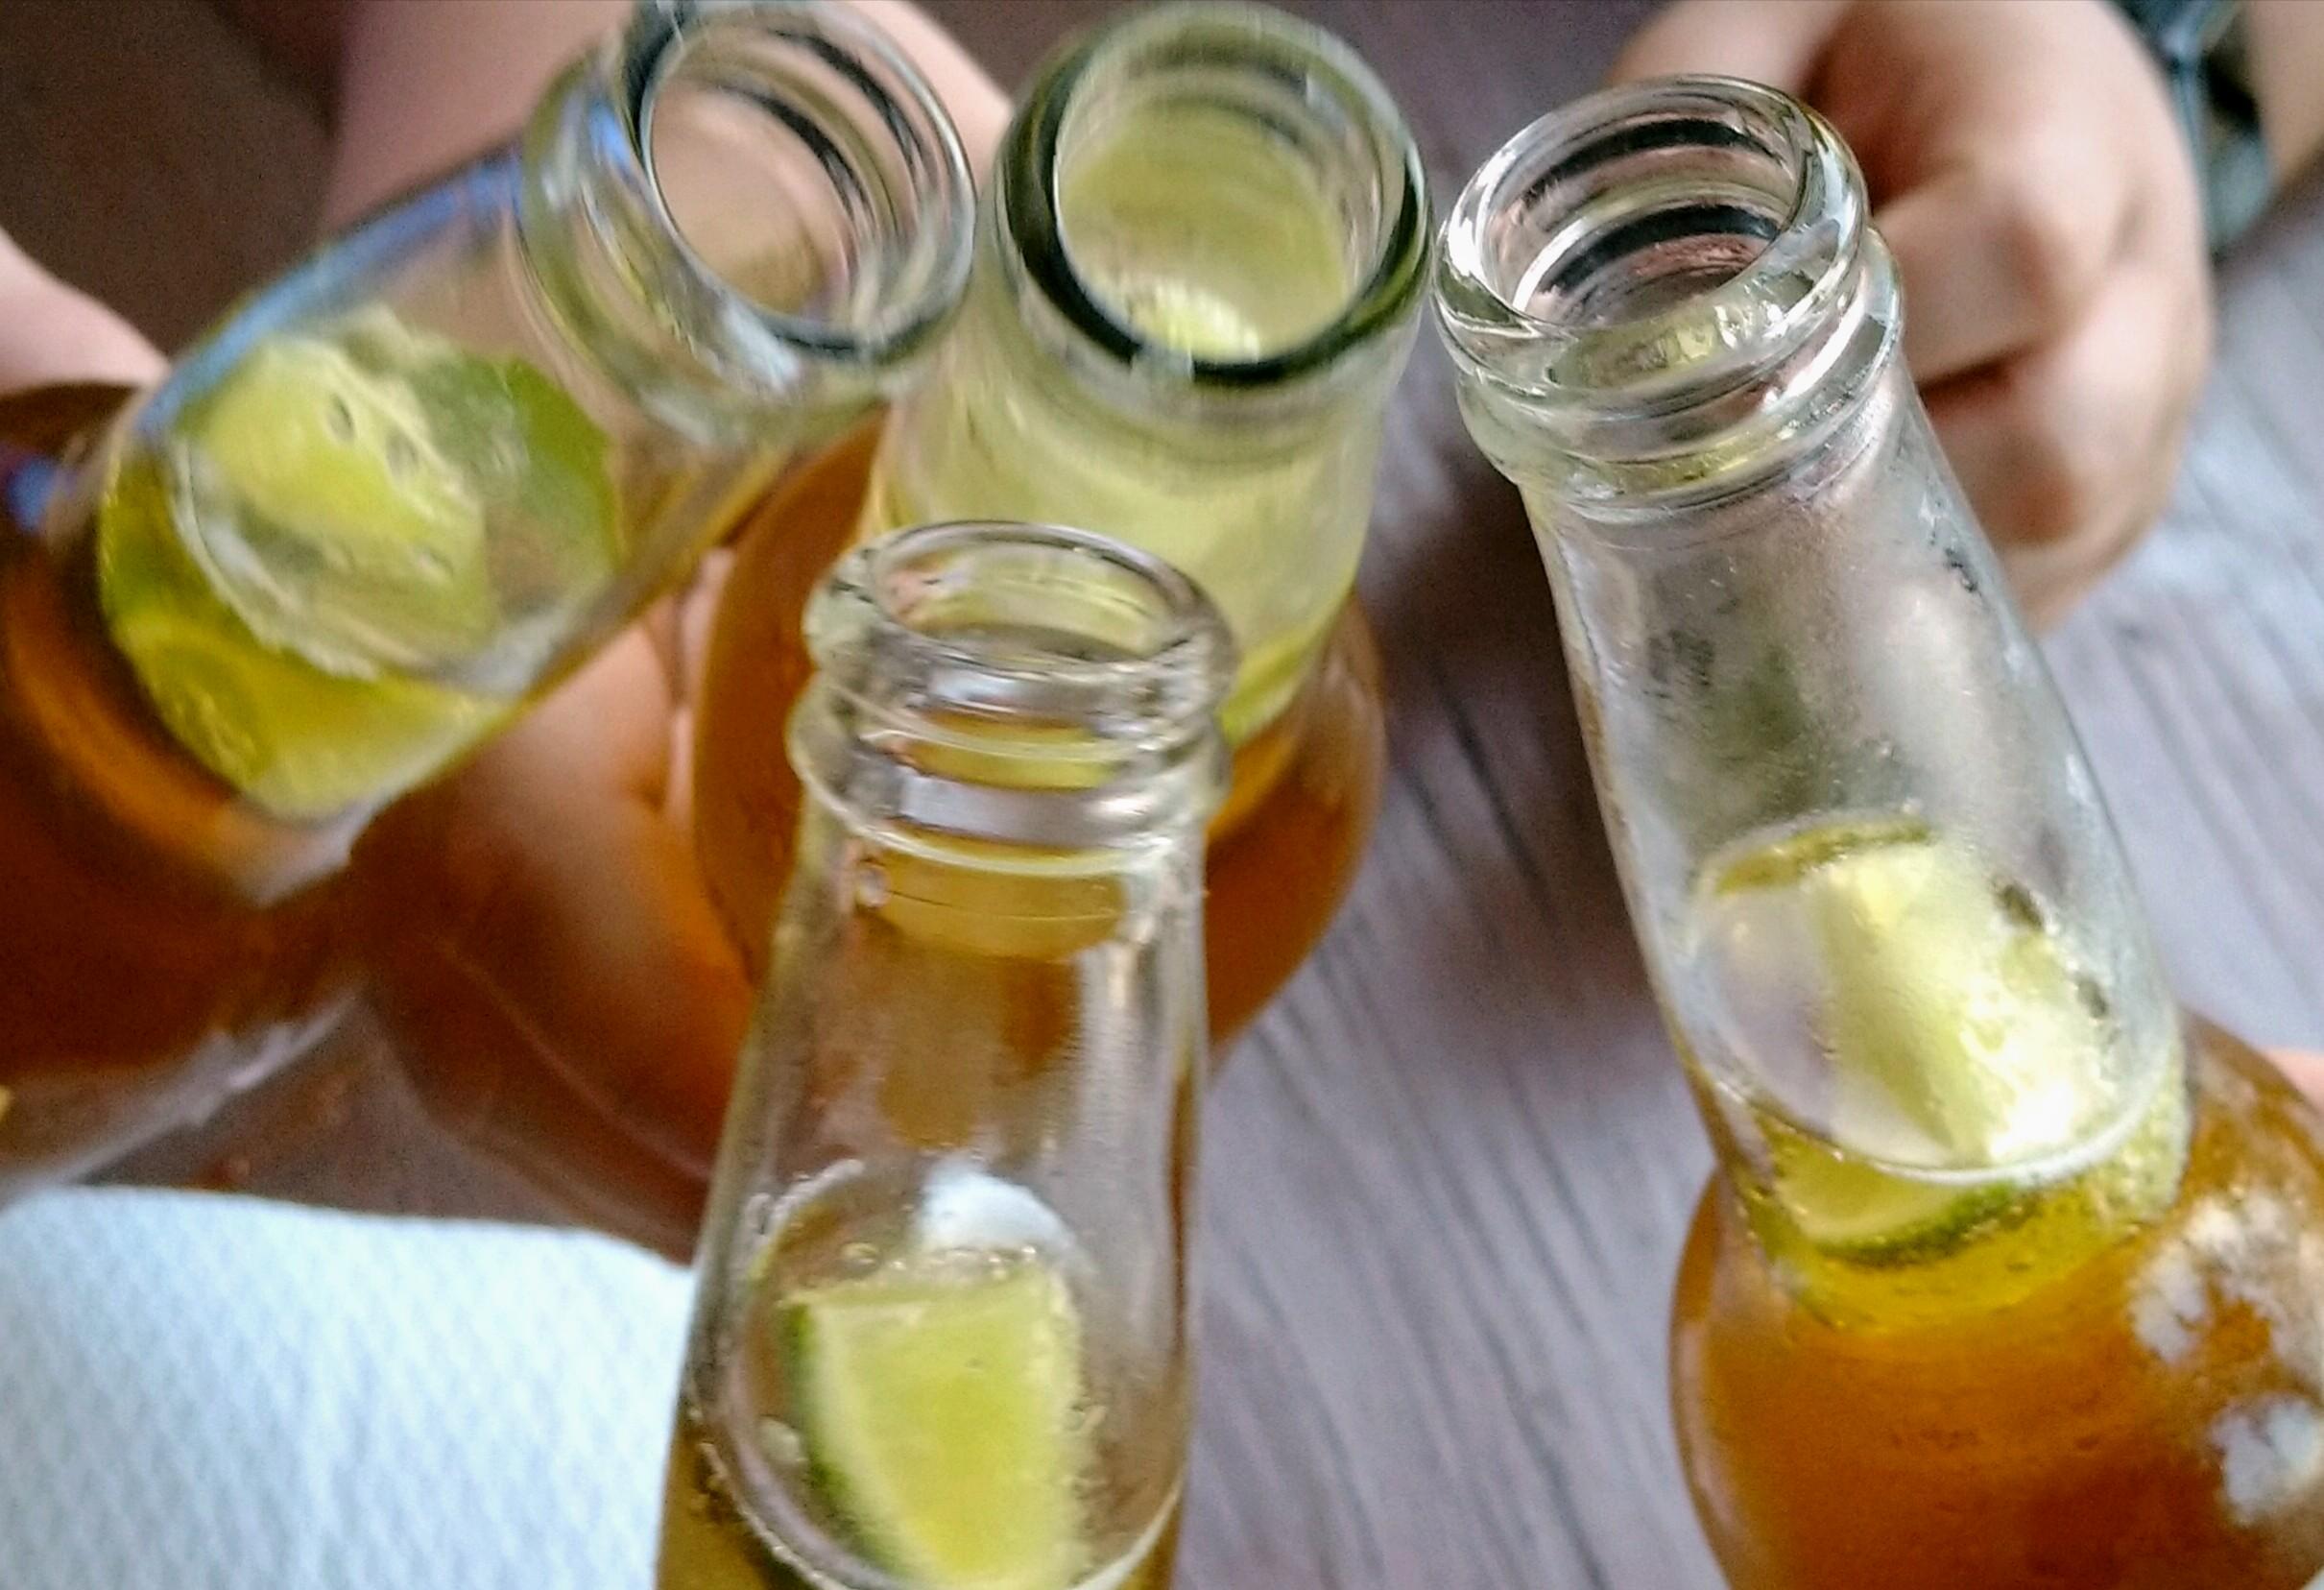 Will Constellation Brands' Beer Portfolio Go Flat In Q2? @themotleyfool #stocks $stz $sam $cgc $bud photo